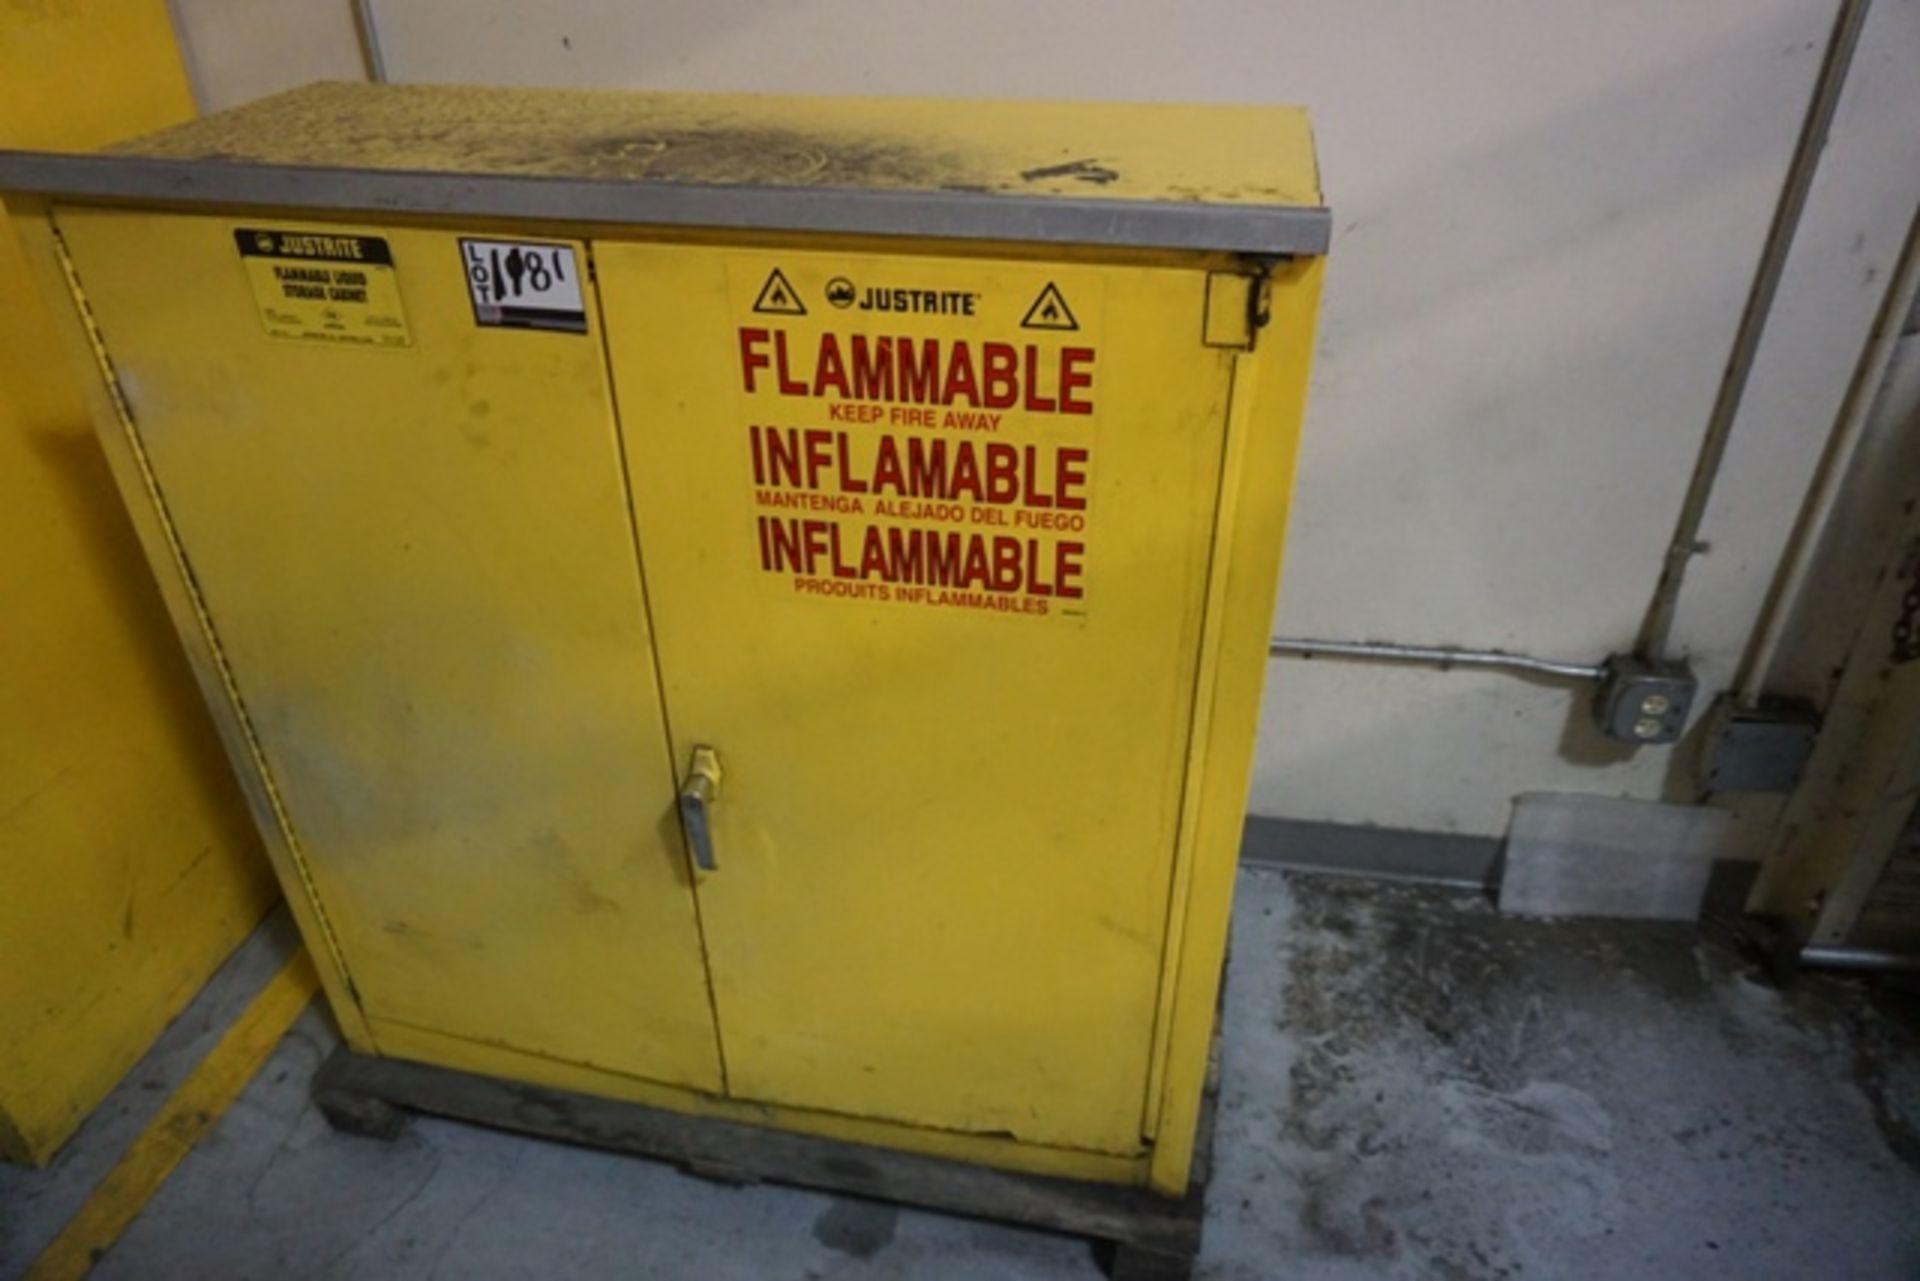 Lot 1181 - Justrite 30 Gal. Cap. Flammable Liquid Storage Cabinet